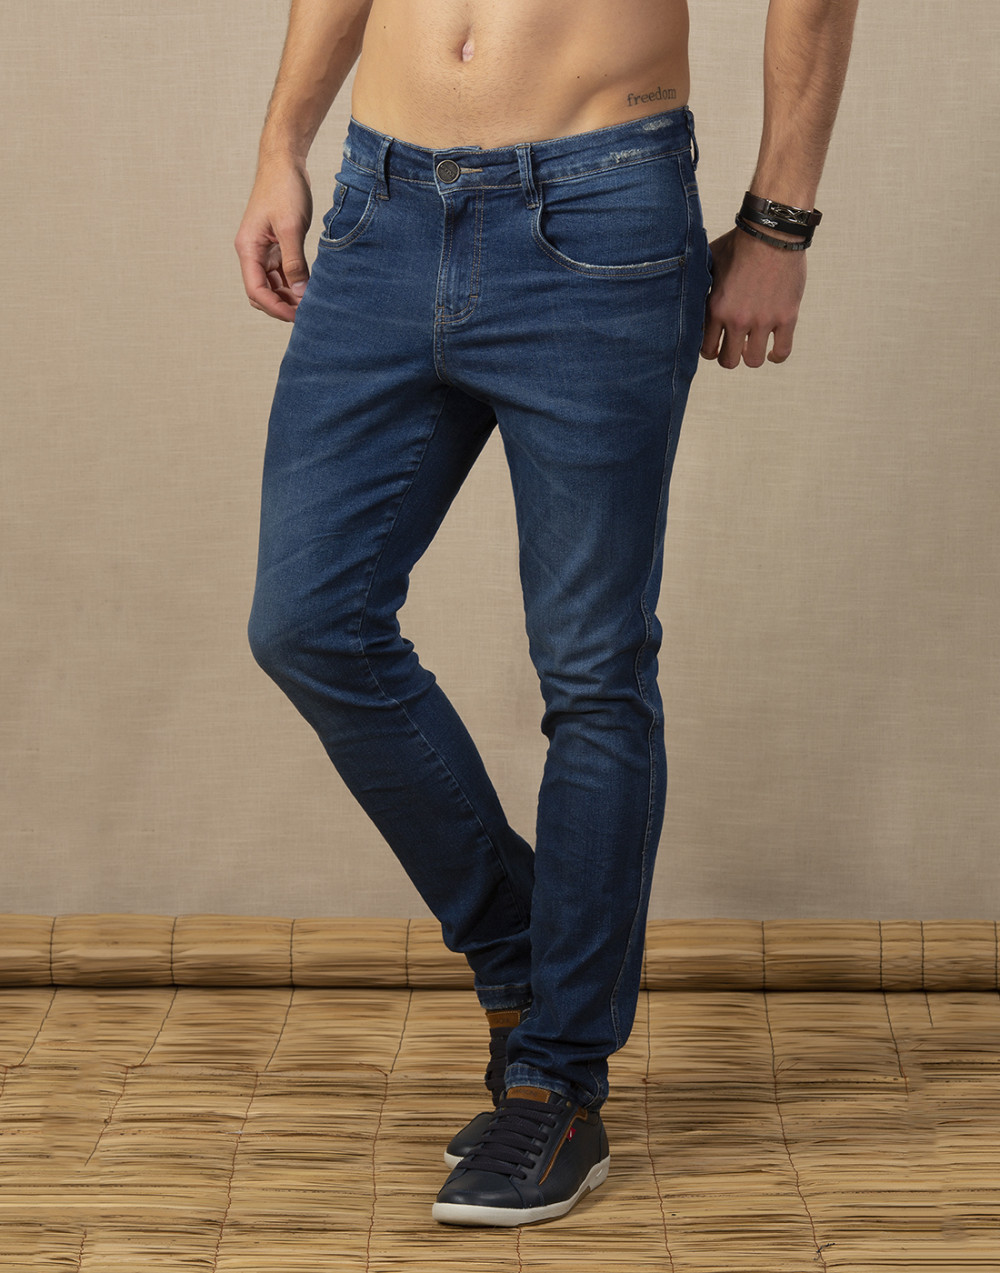 Calça Jeans New Sallo Jeans